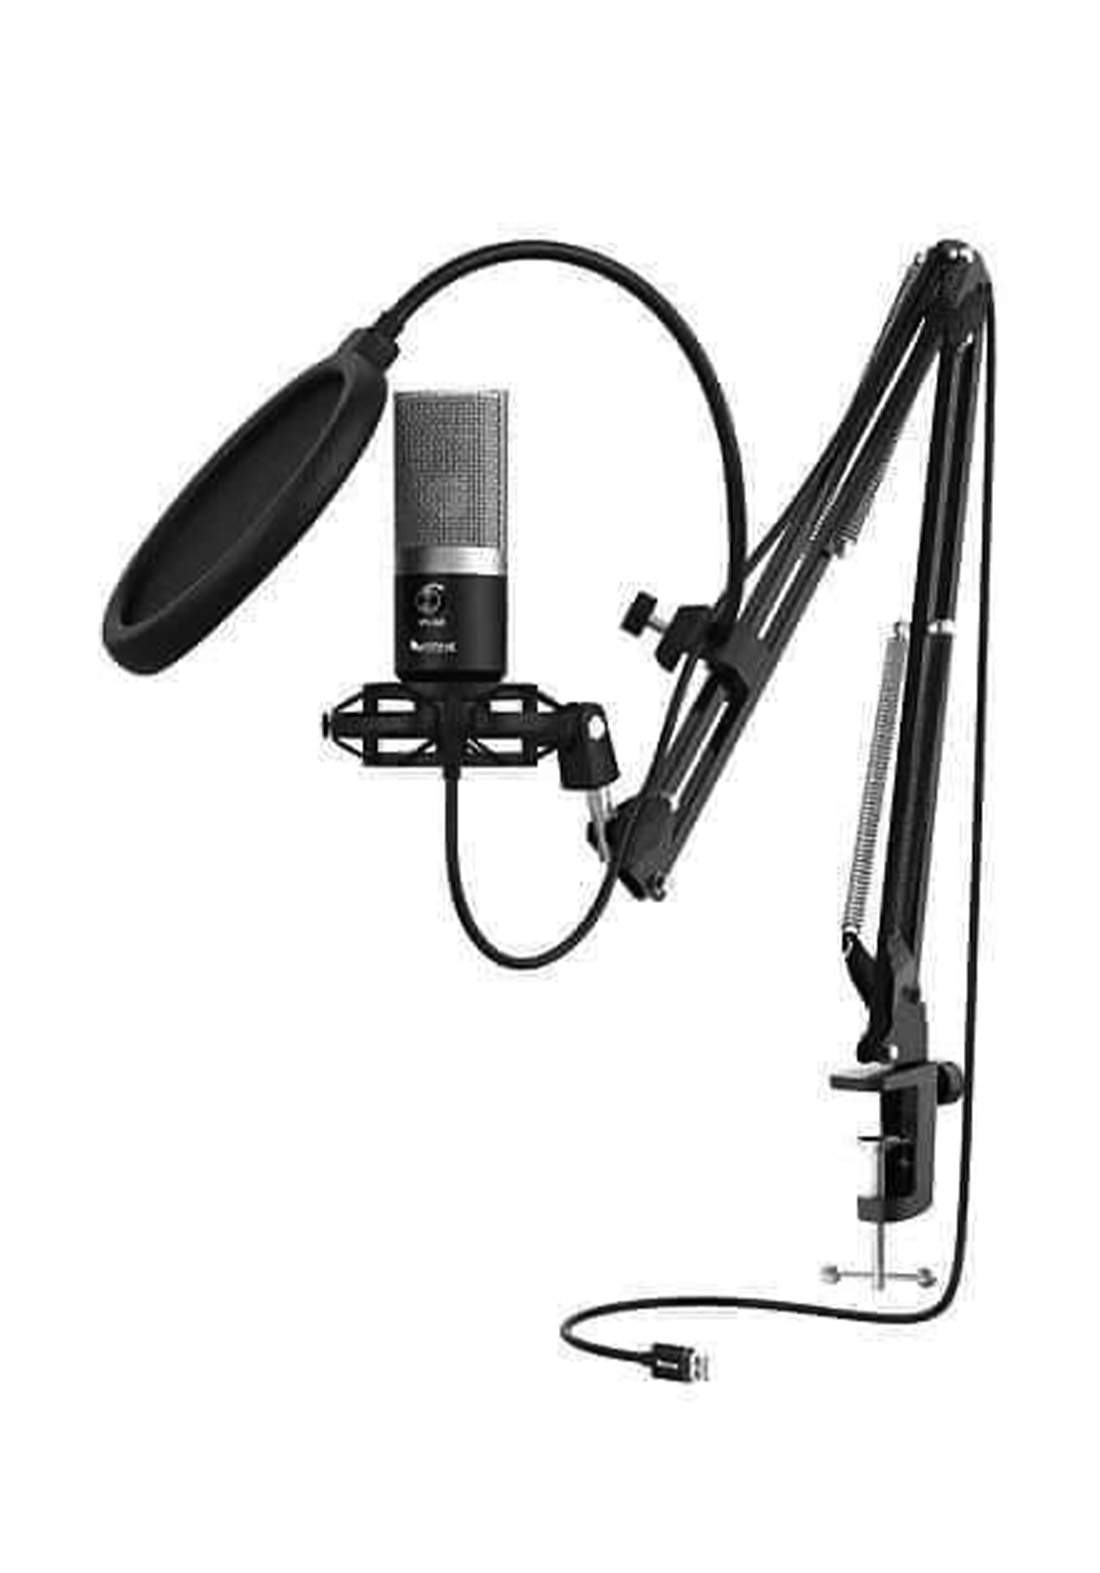 Fifine T670 USB Studio Condenser Microphone-Black مايكروفون